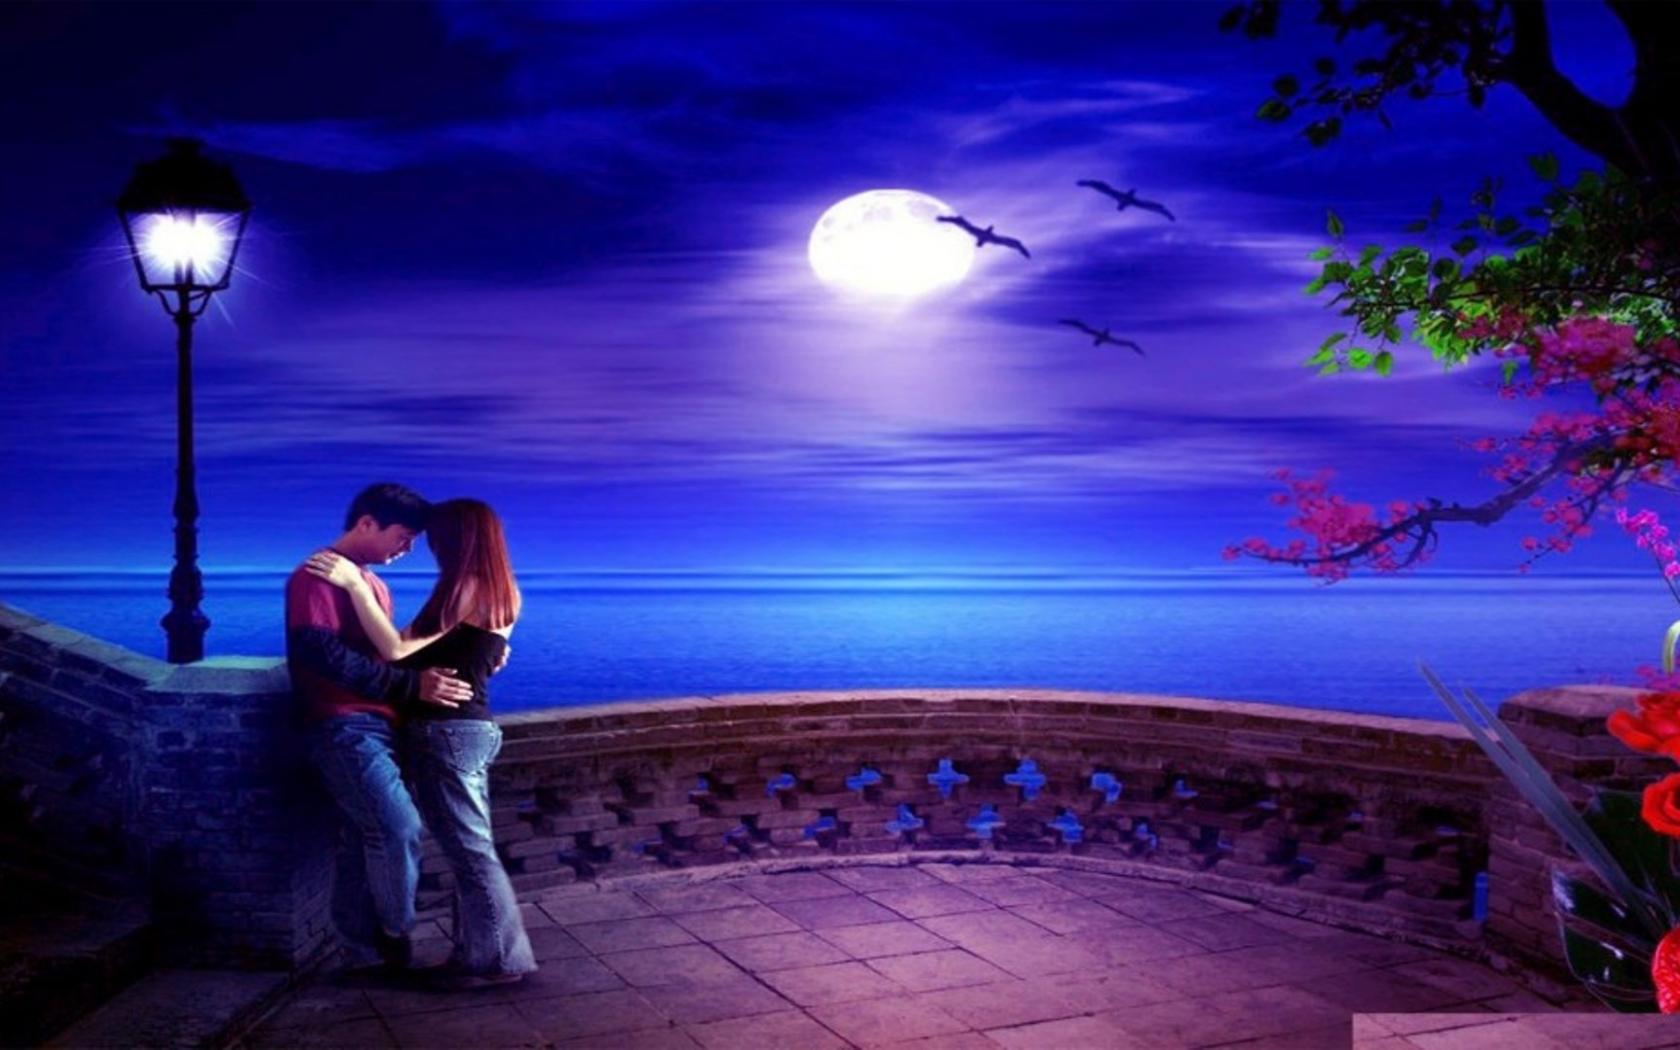 Free Download Romantic Love Wallpaper Download Hd Romantic